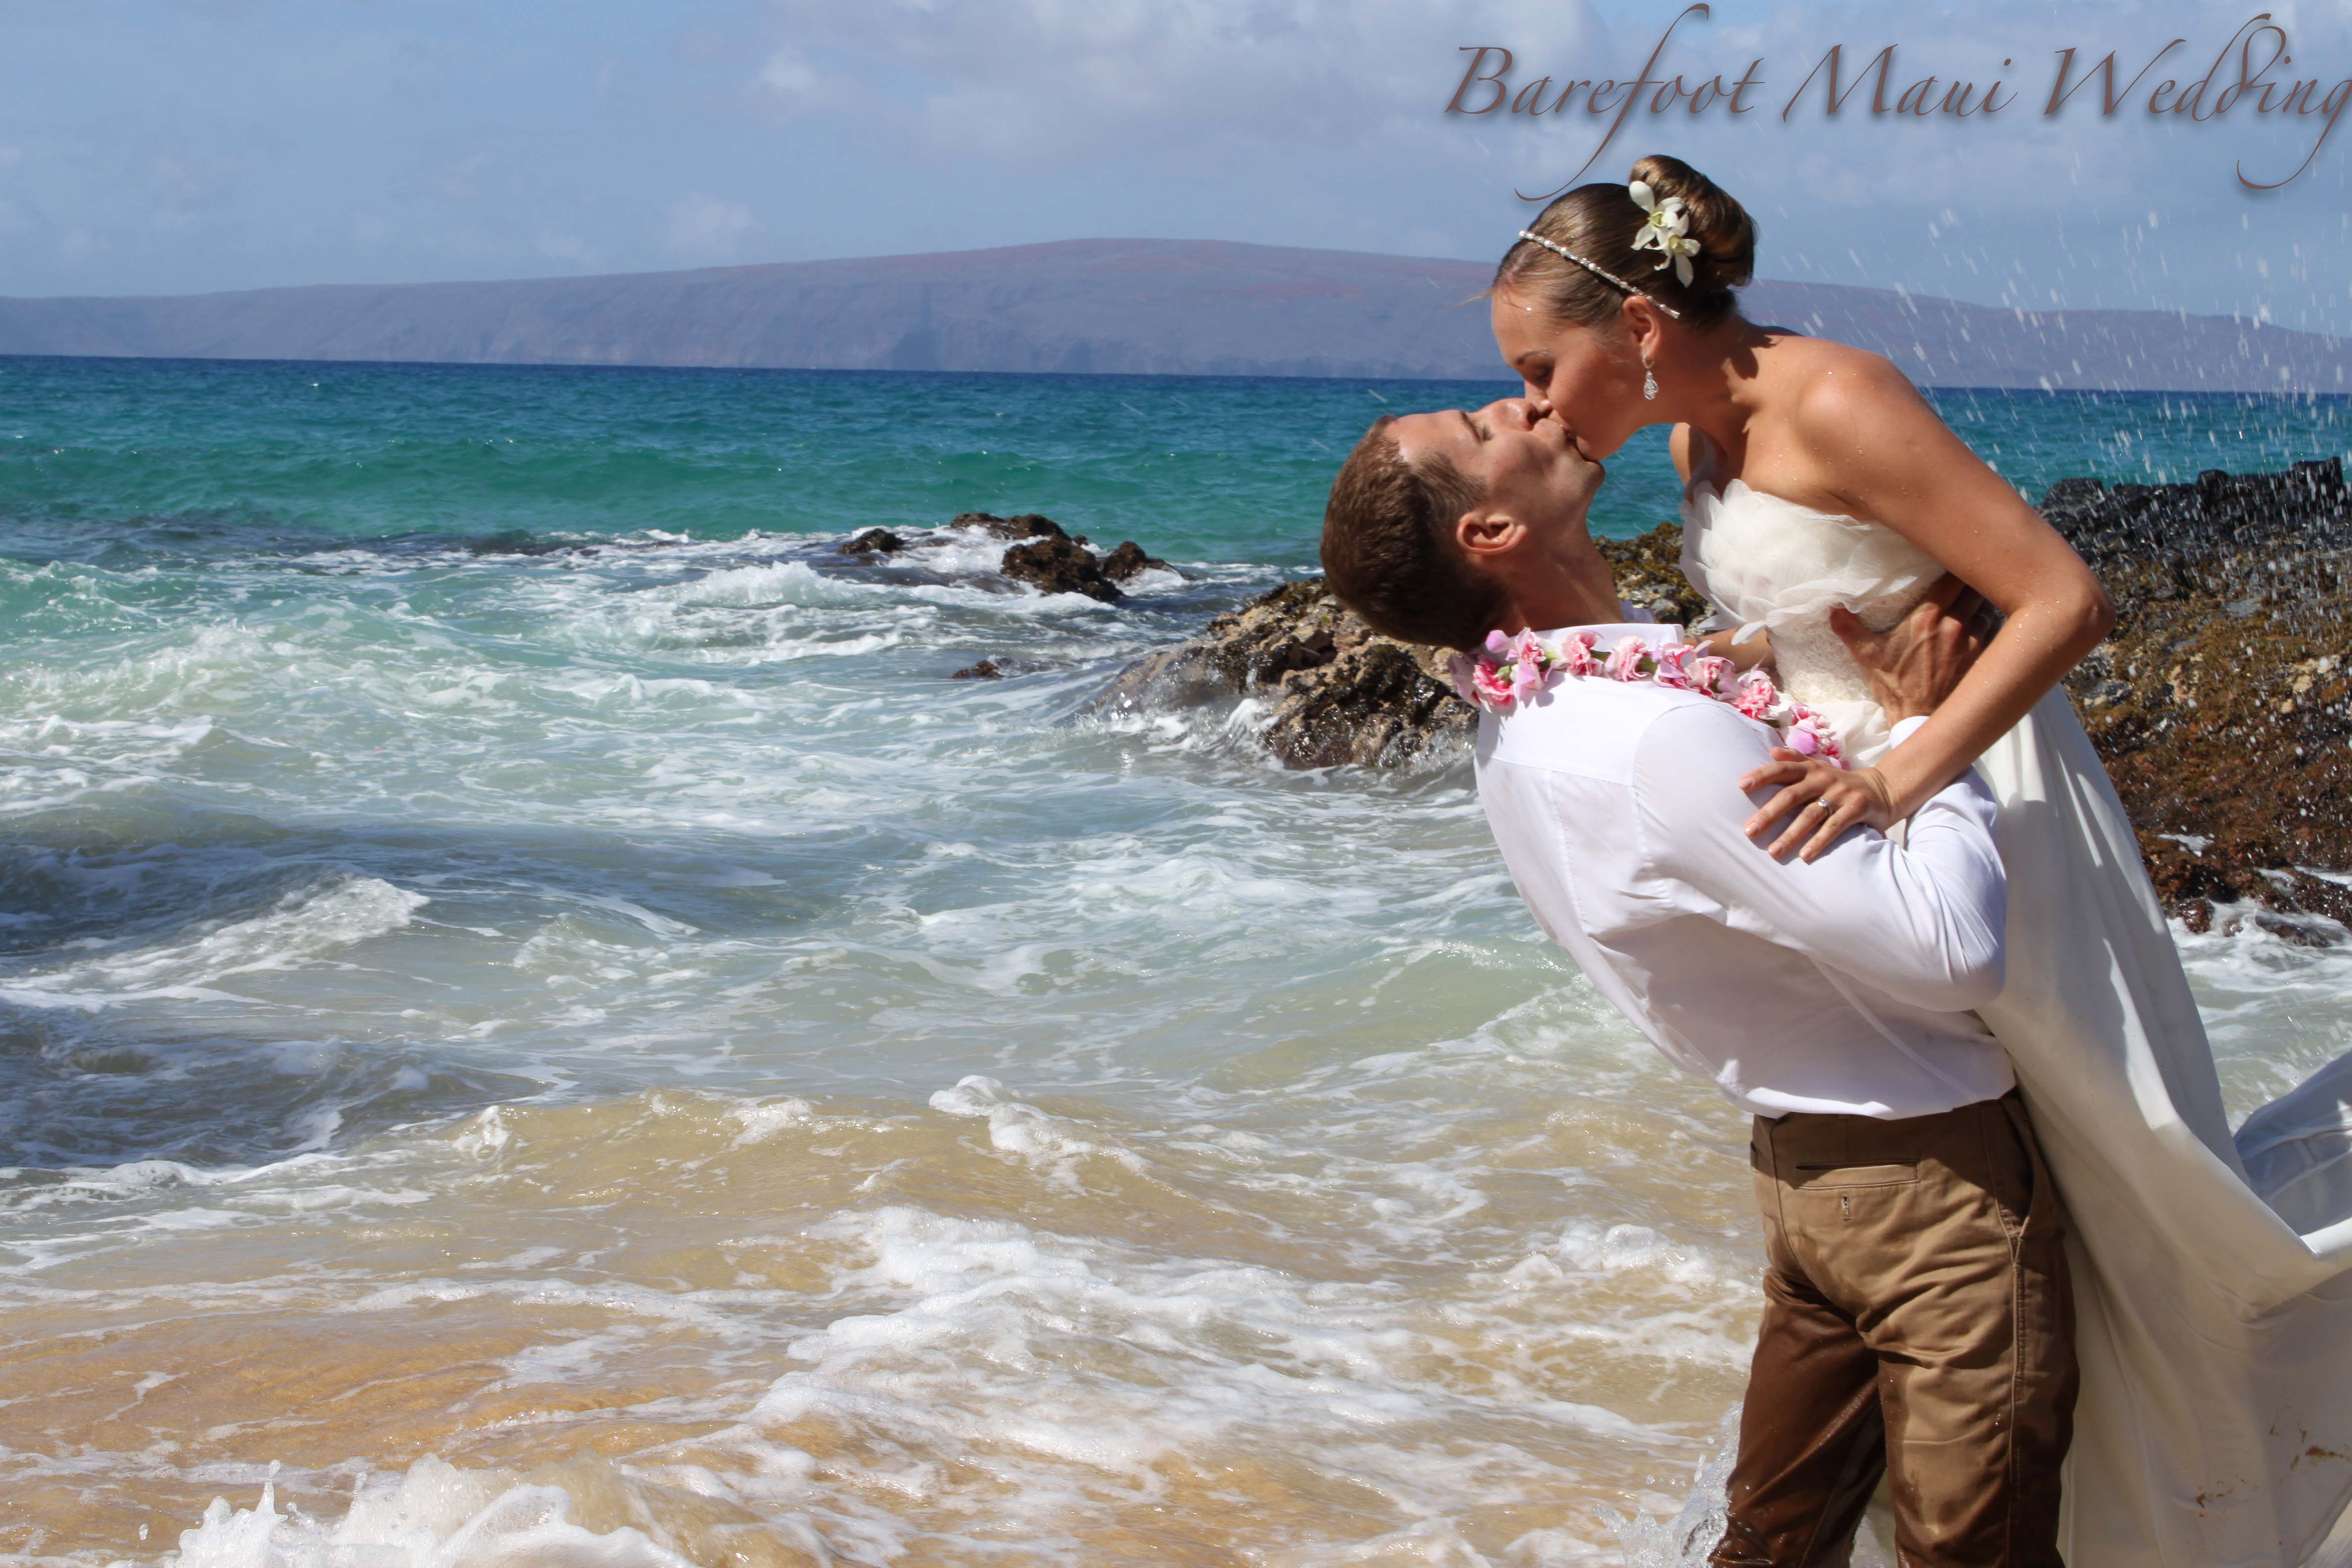 Barefoot Maui Wedding Fun PHotography-8